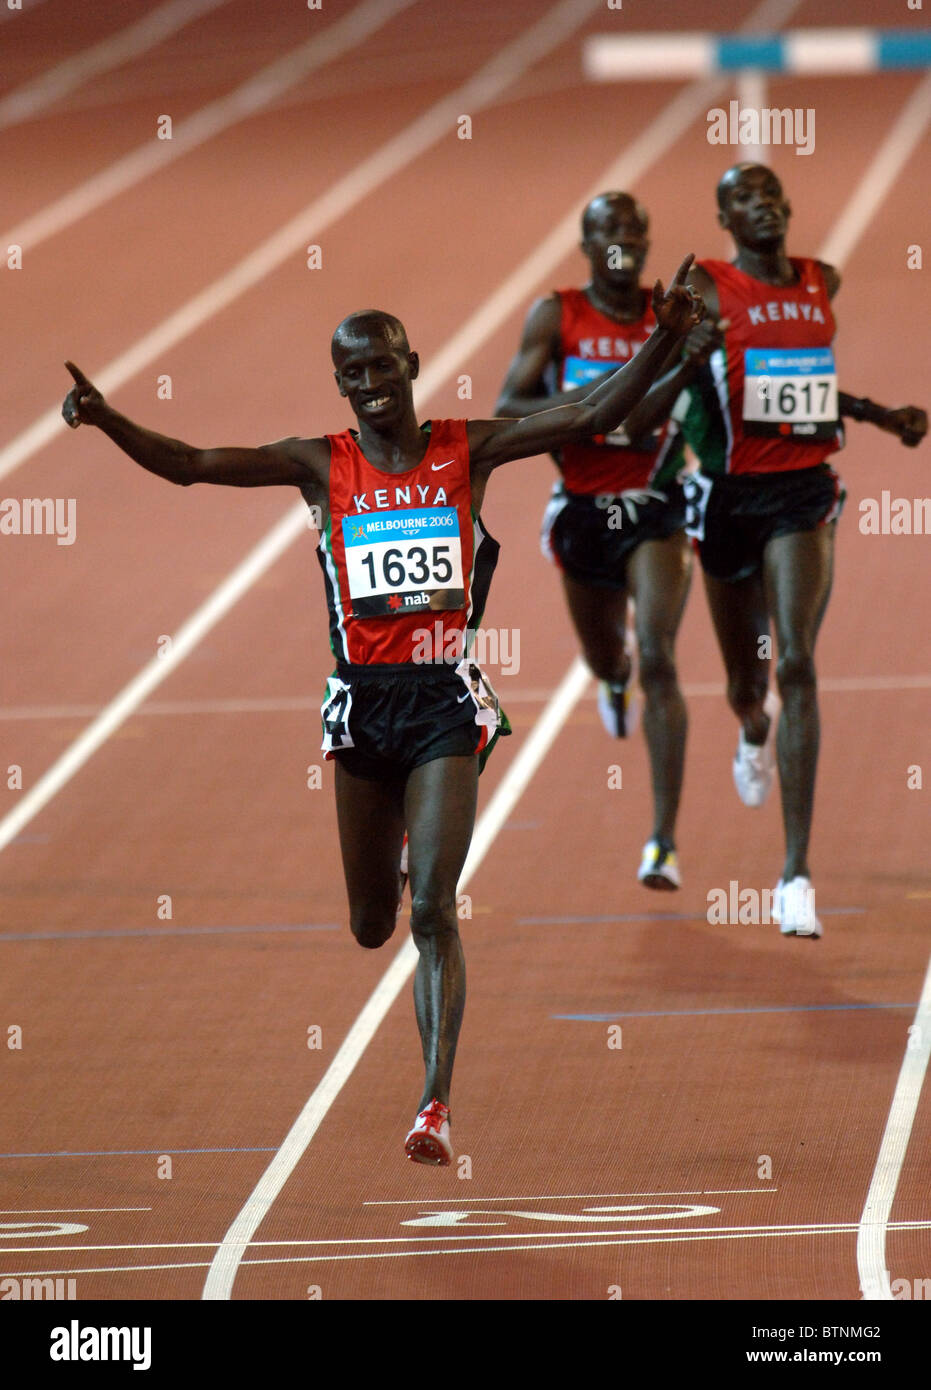 Les sprinters du Kenya Banque D'Images